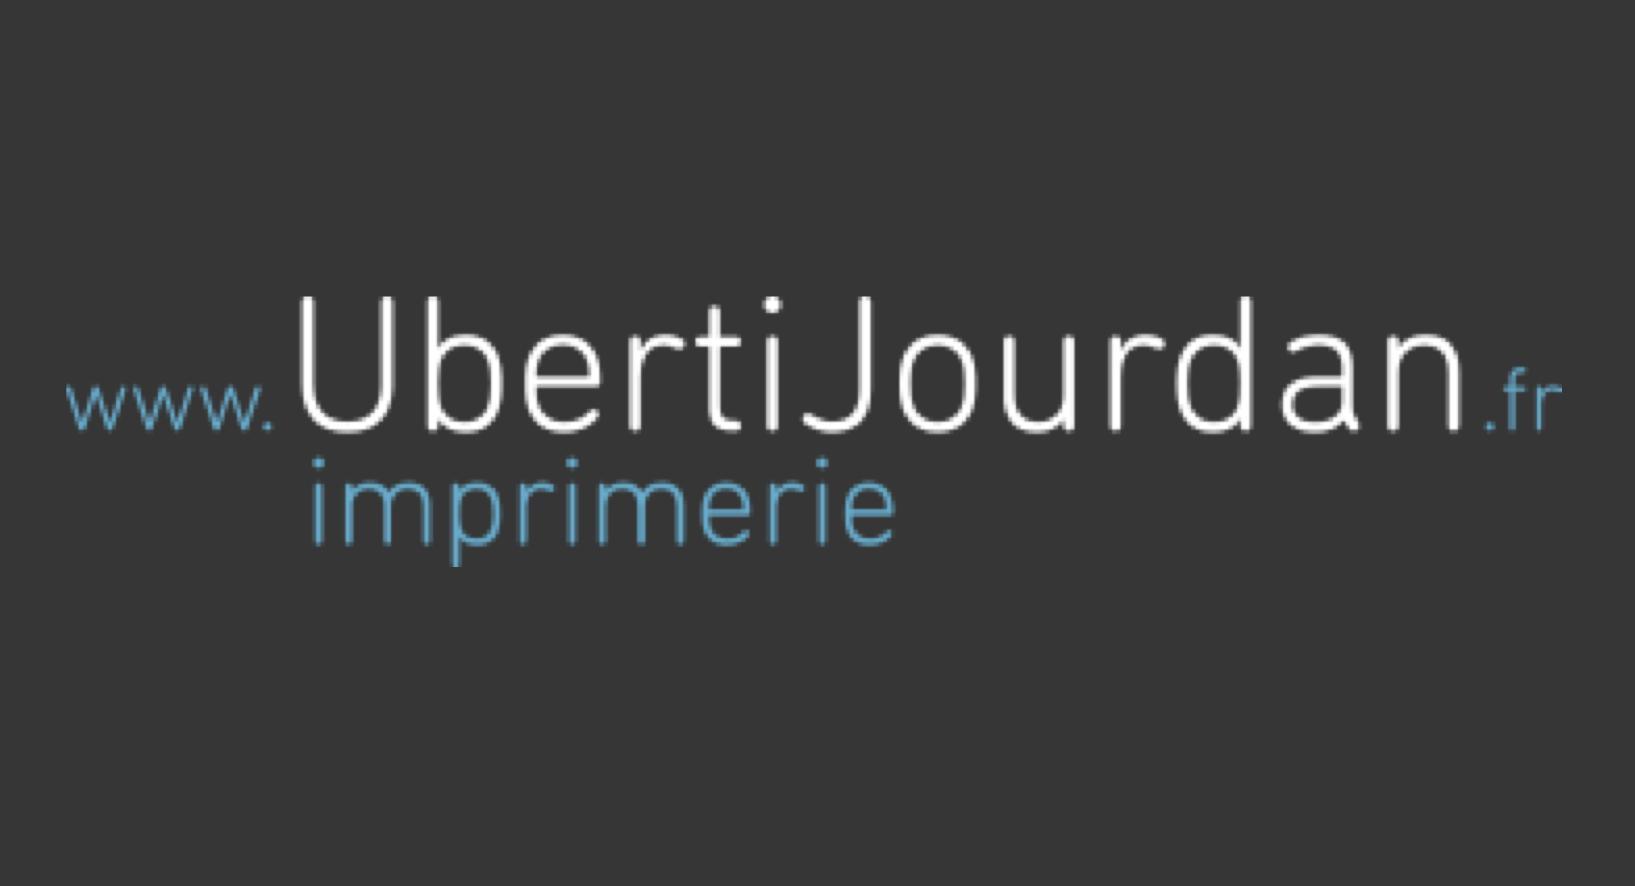 logo Uberti Jourdan